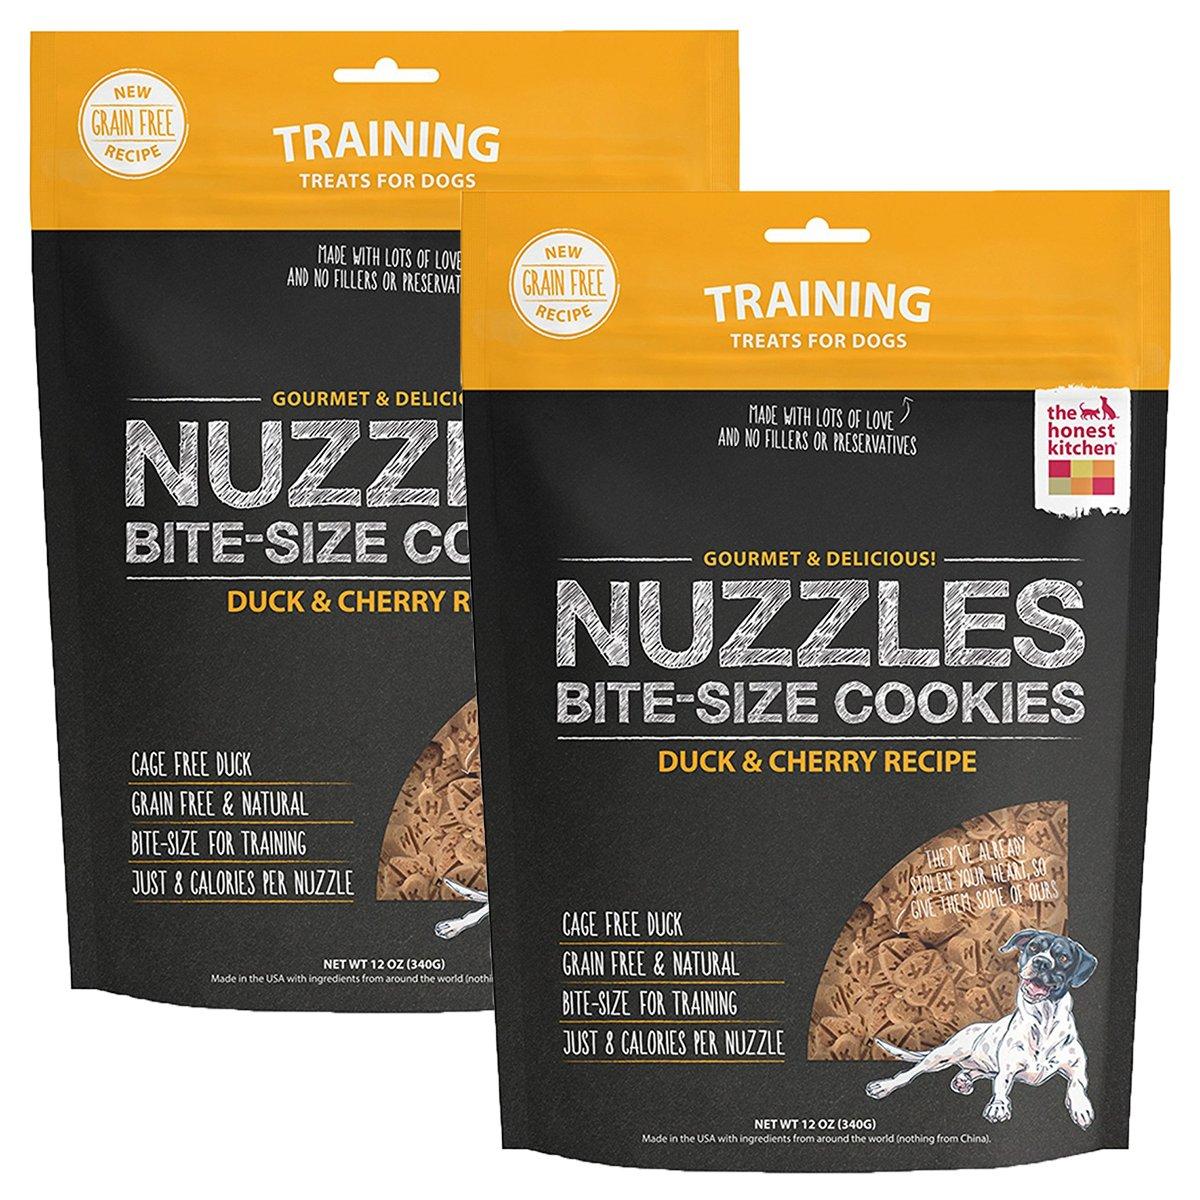 Honest Kitchen The Dog Grain Free Training Treats